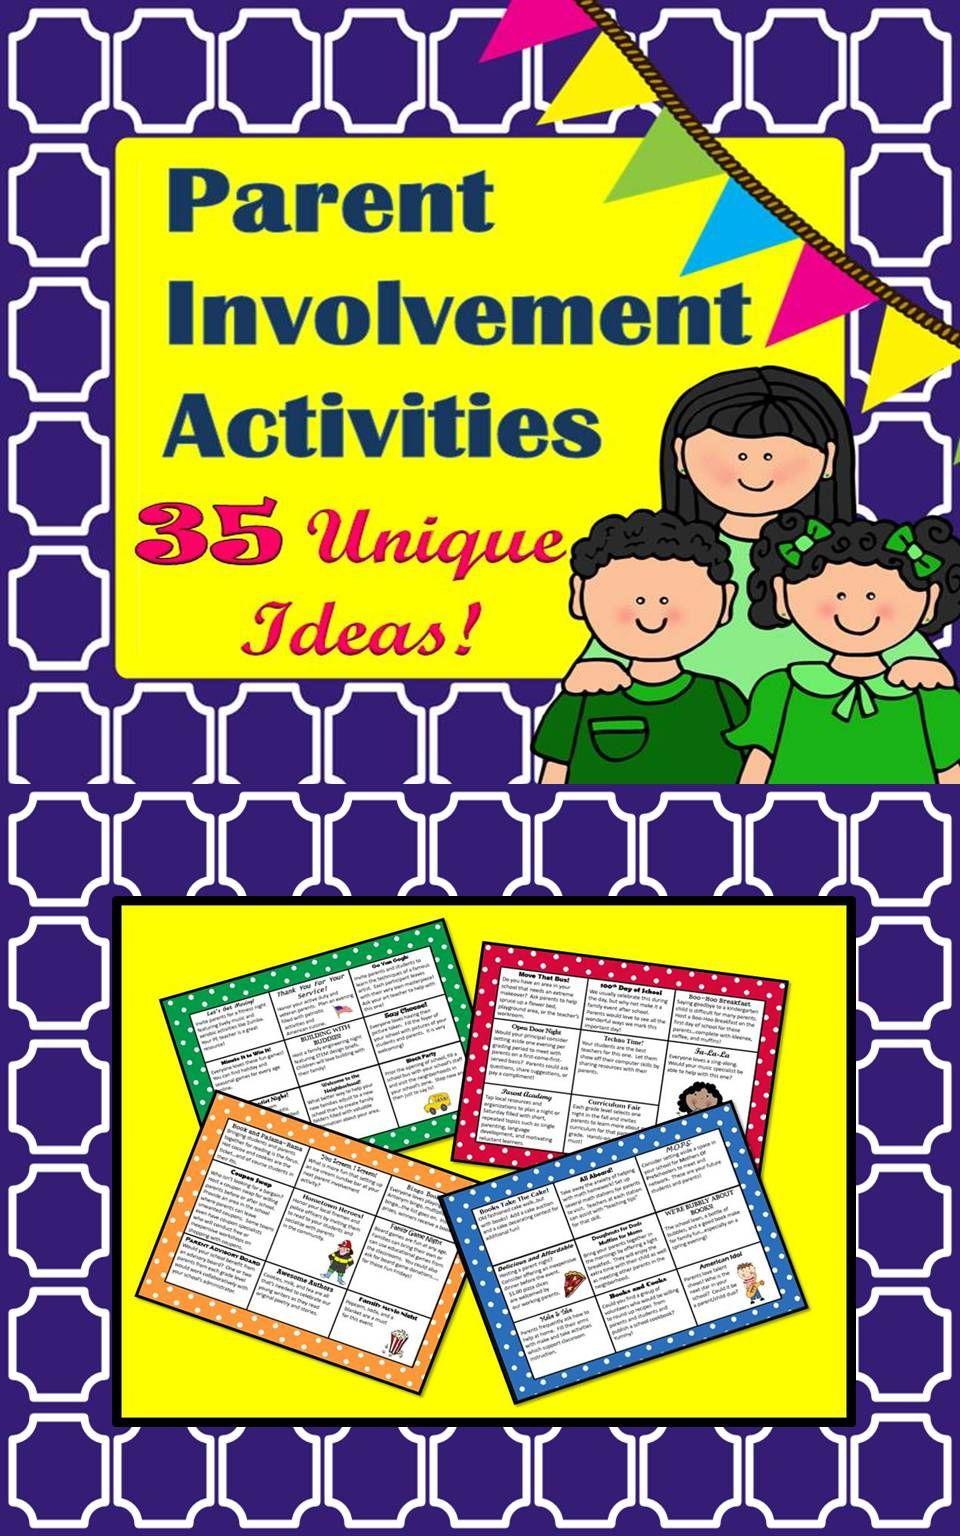 Parent Involvement Activities with Pizzazz | Parent involvement ...